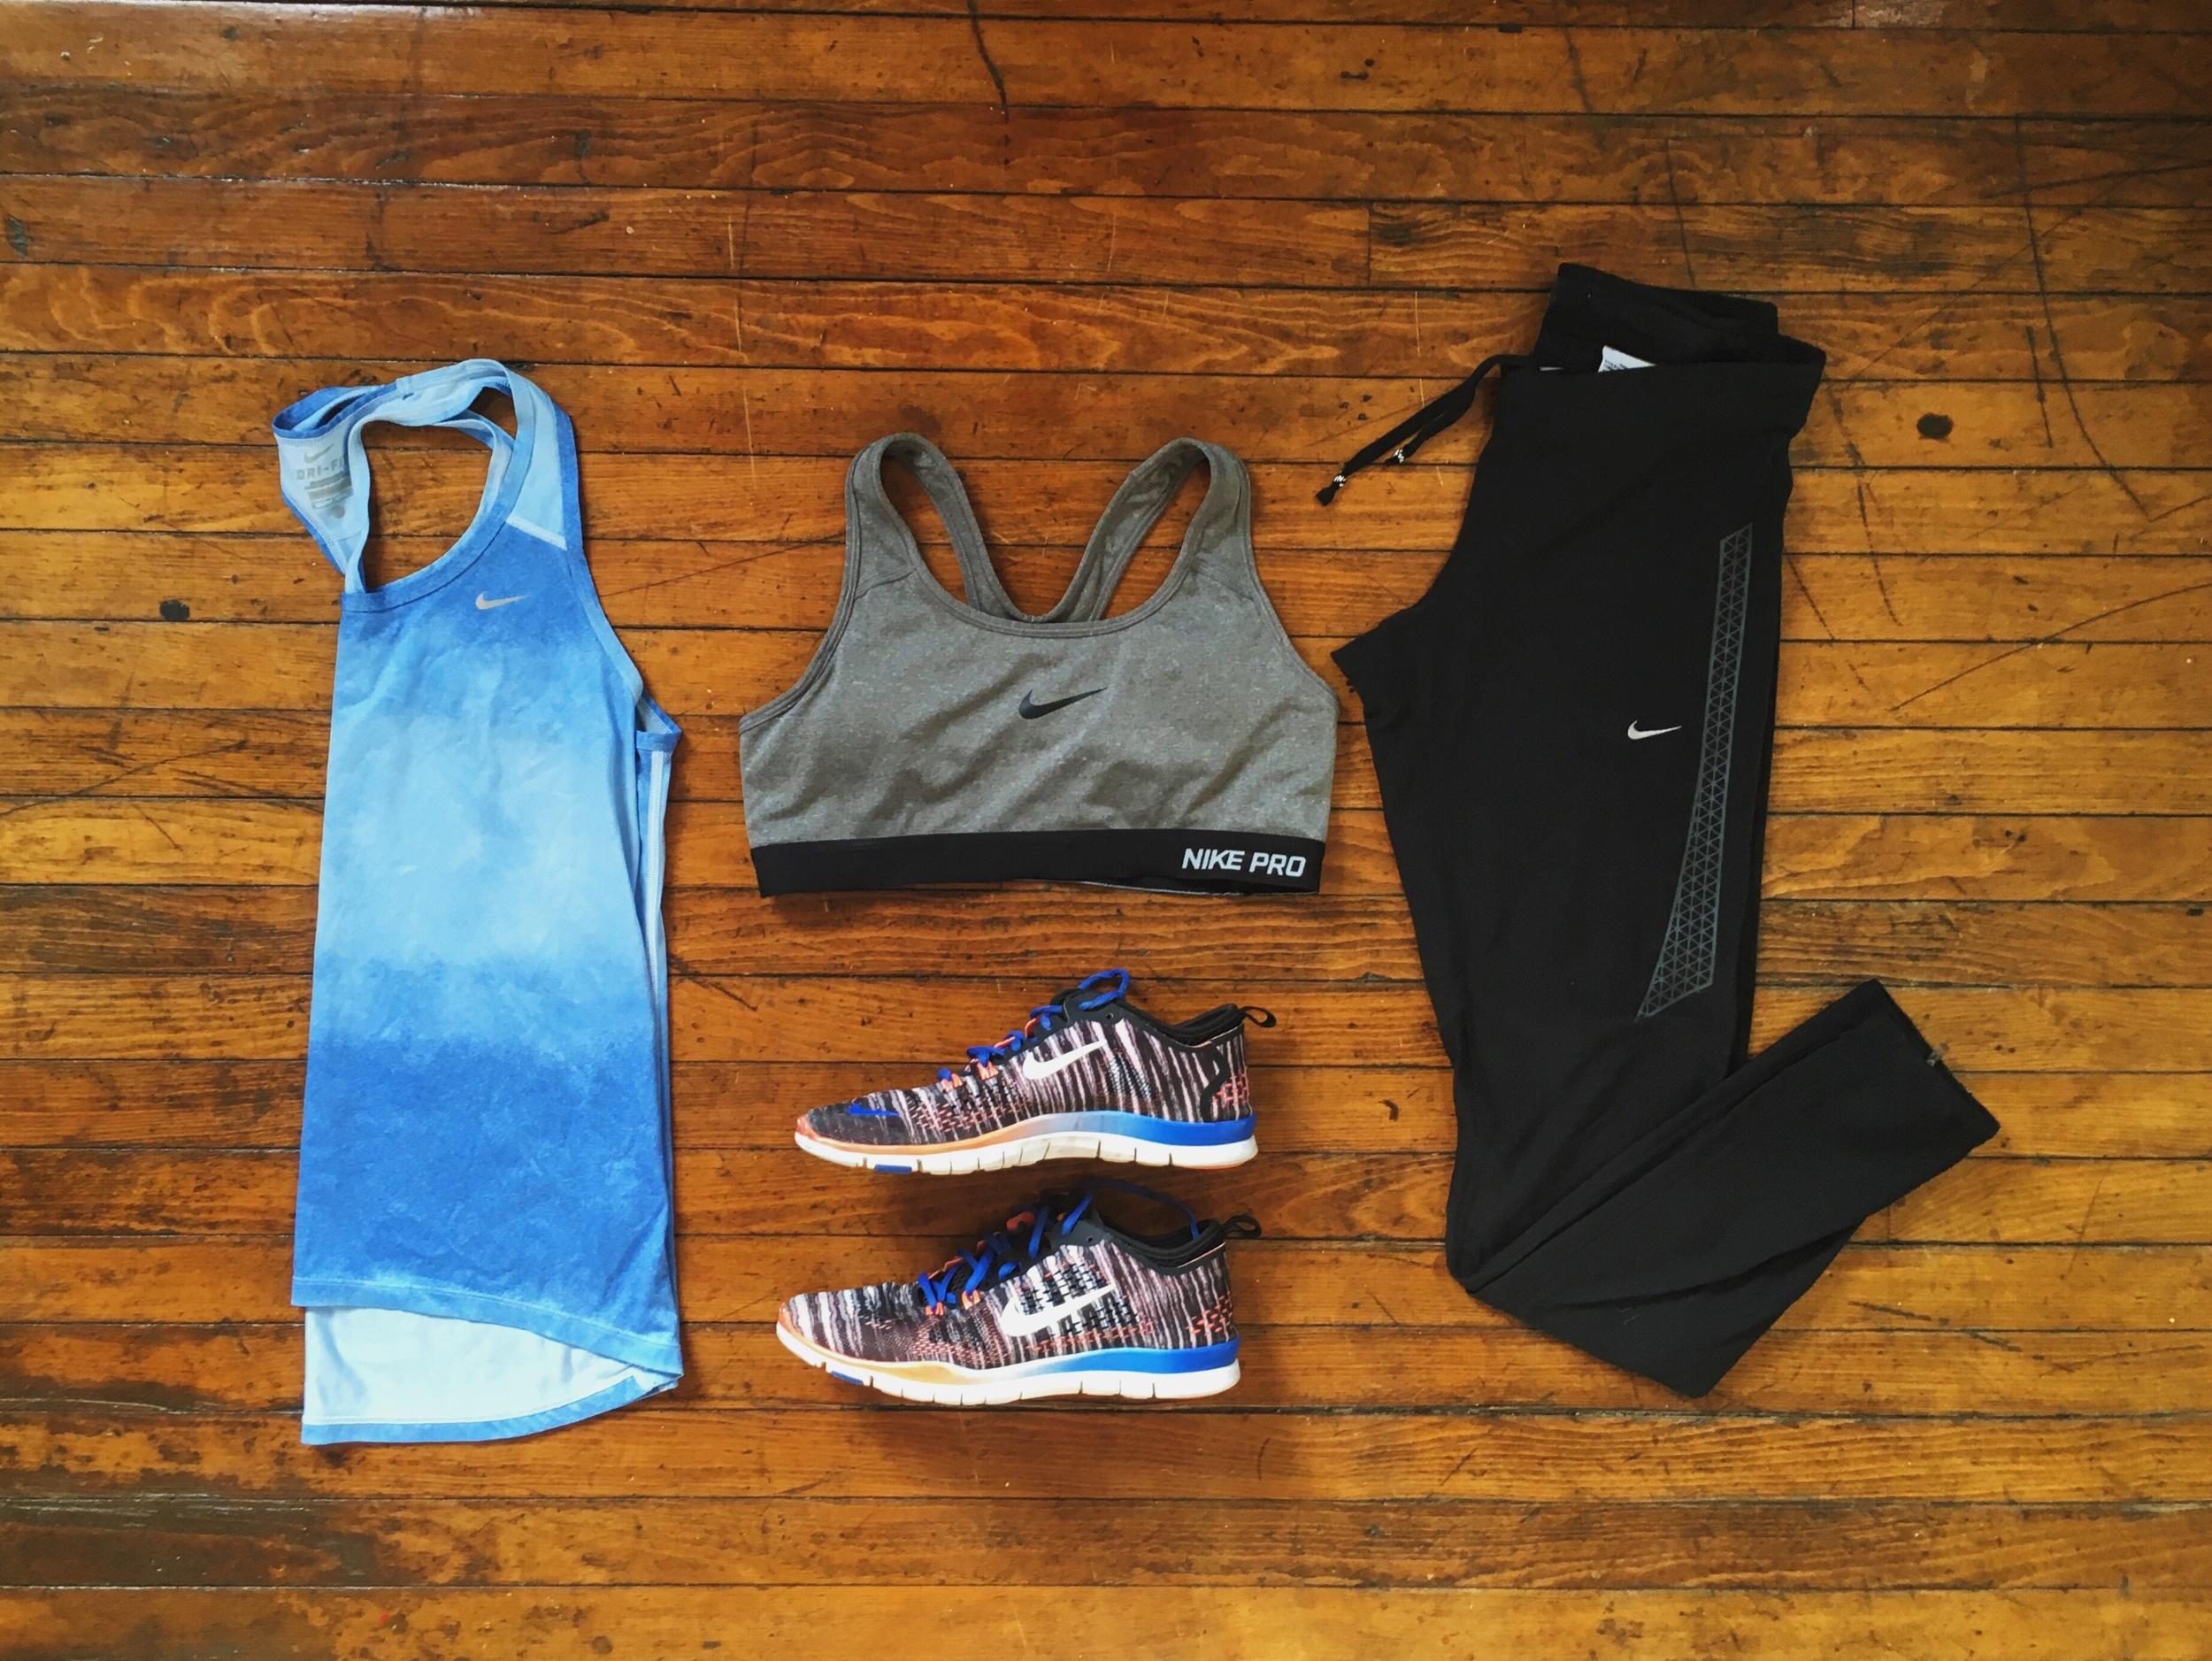 (1) Tank:Nike (2) Sports Bra:Nike (3) Shoes:Nike (4) Leggings:Nike